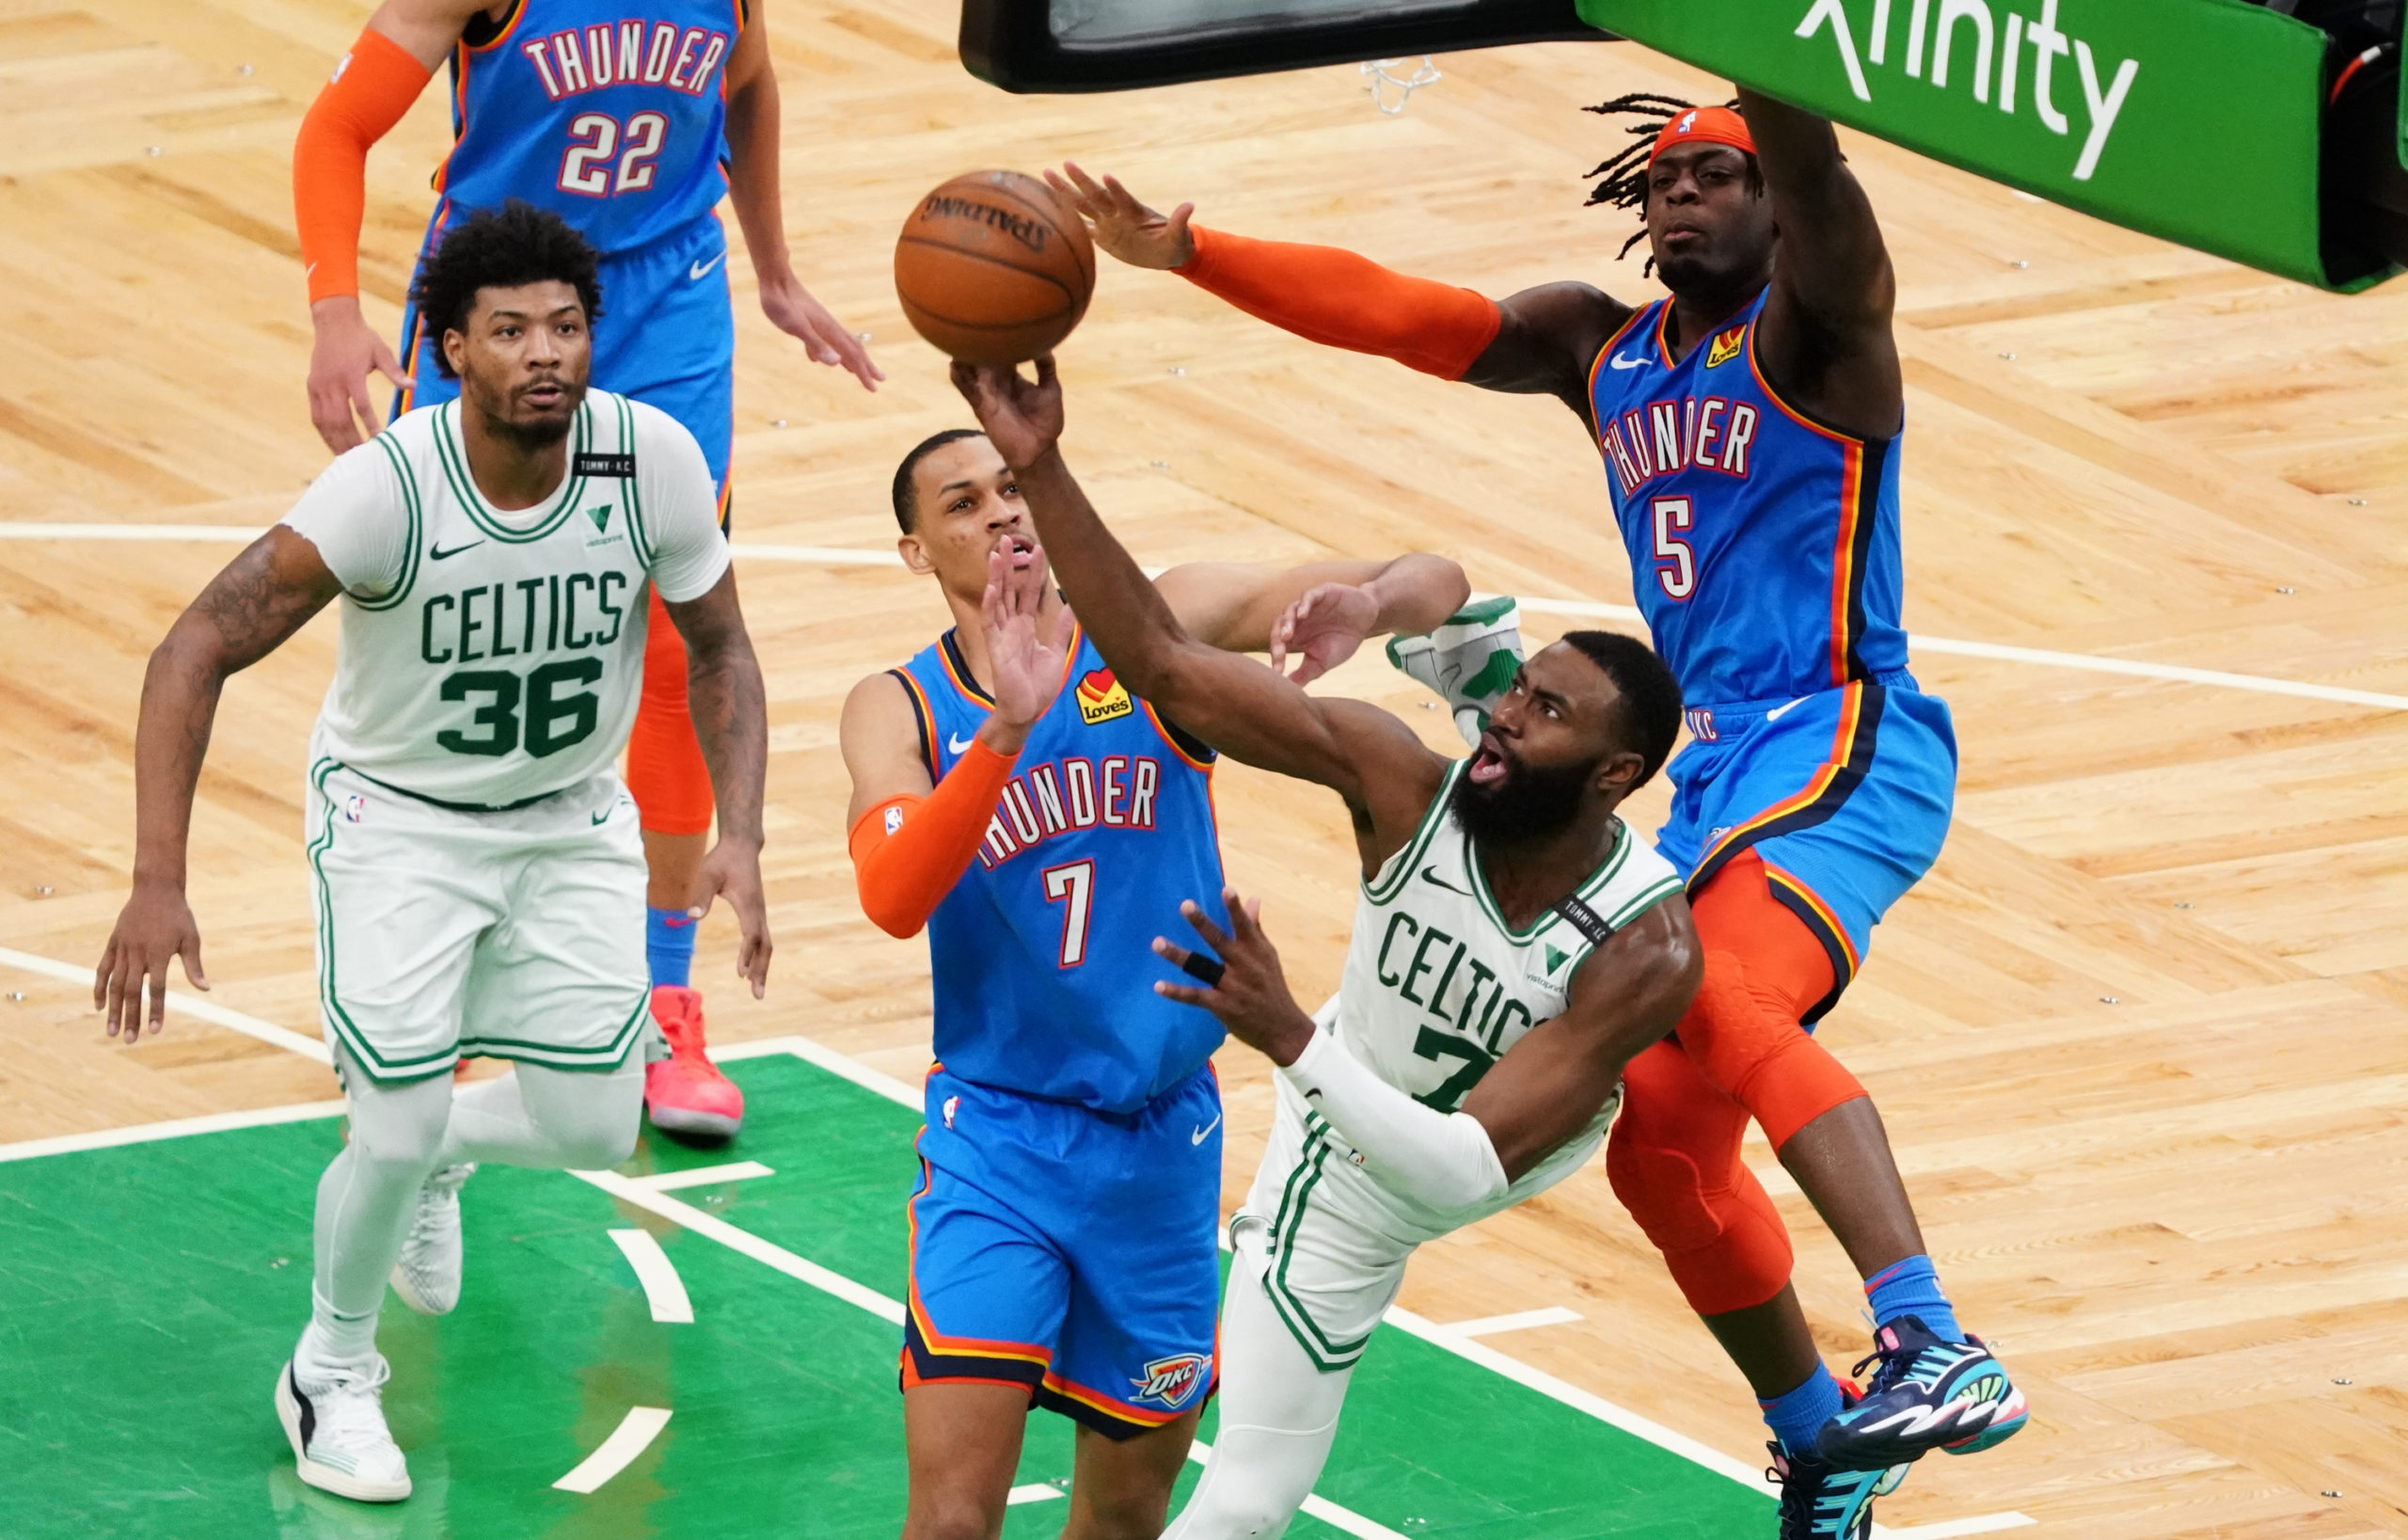 Celtics Brown